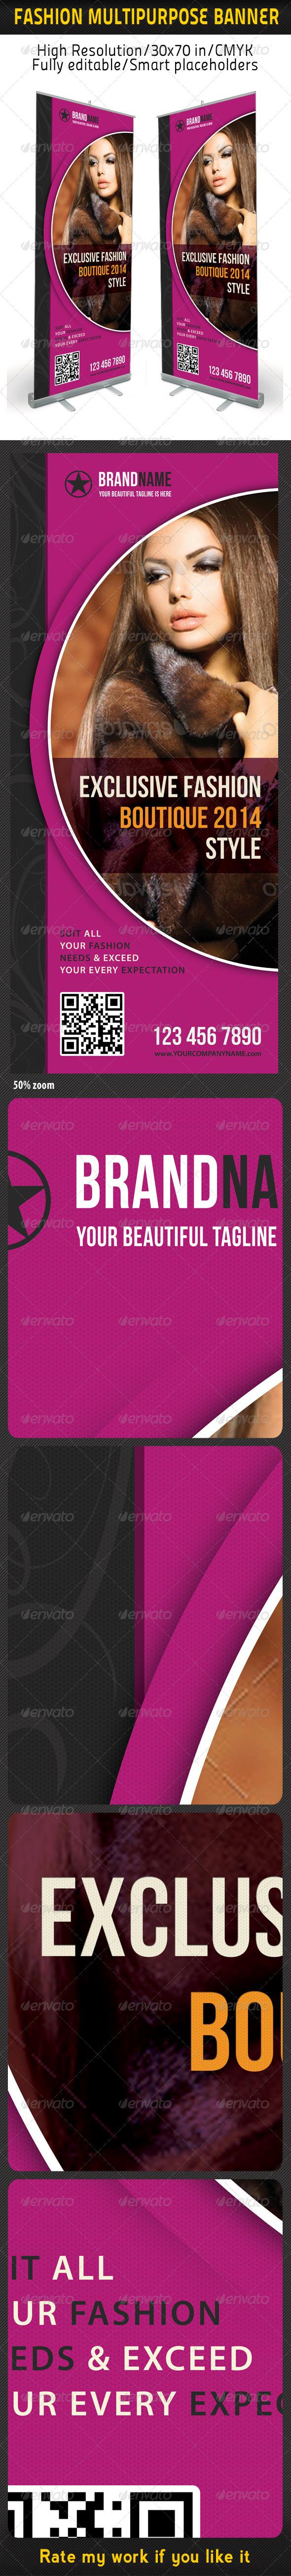 Fashion Multipurpose Banner Template 19 - Signage Print Templates